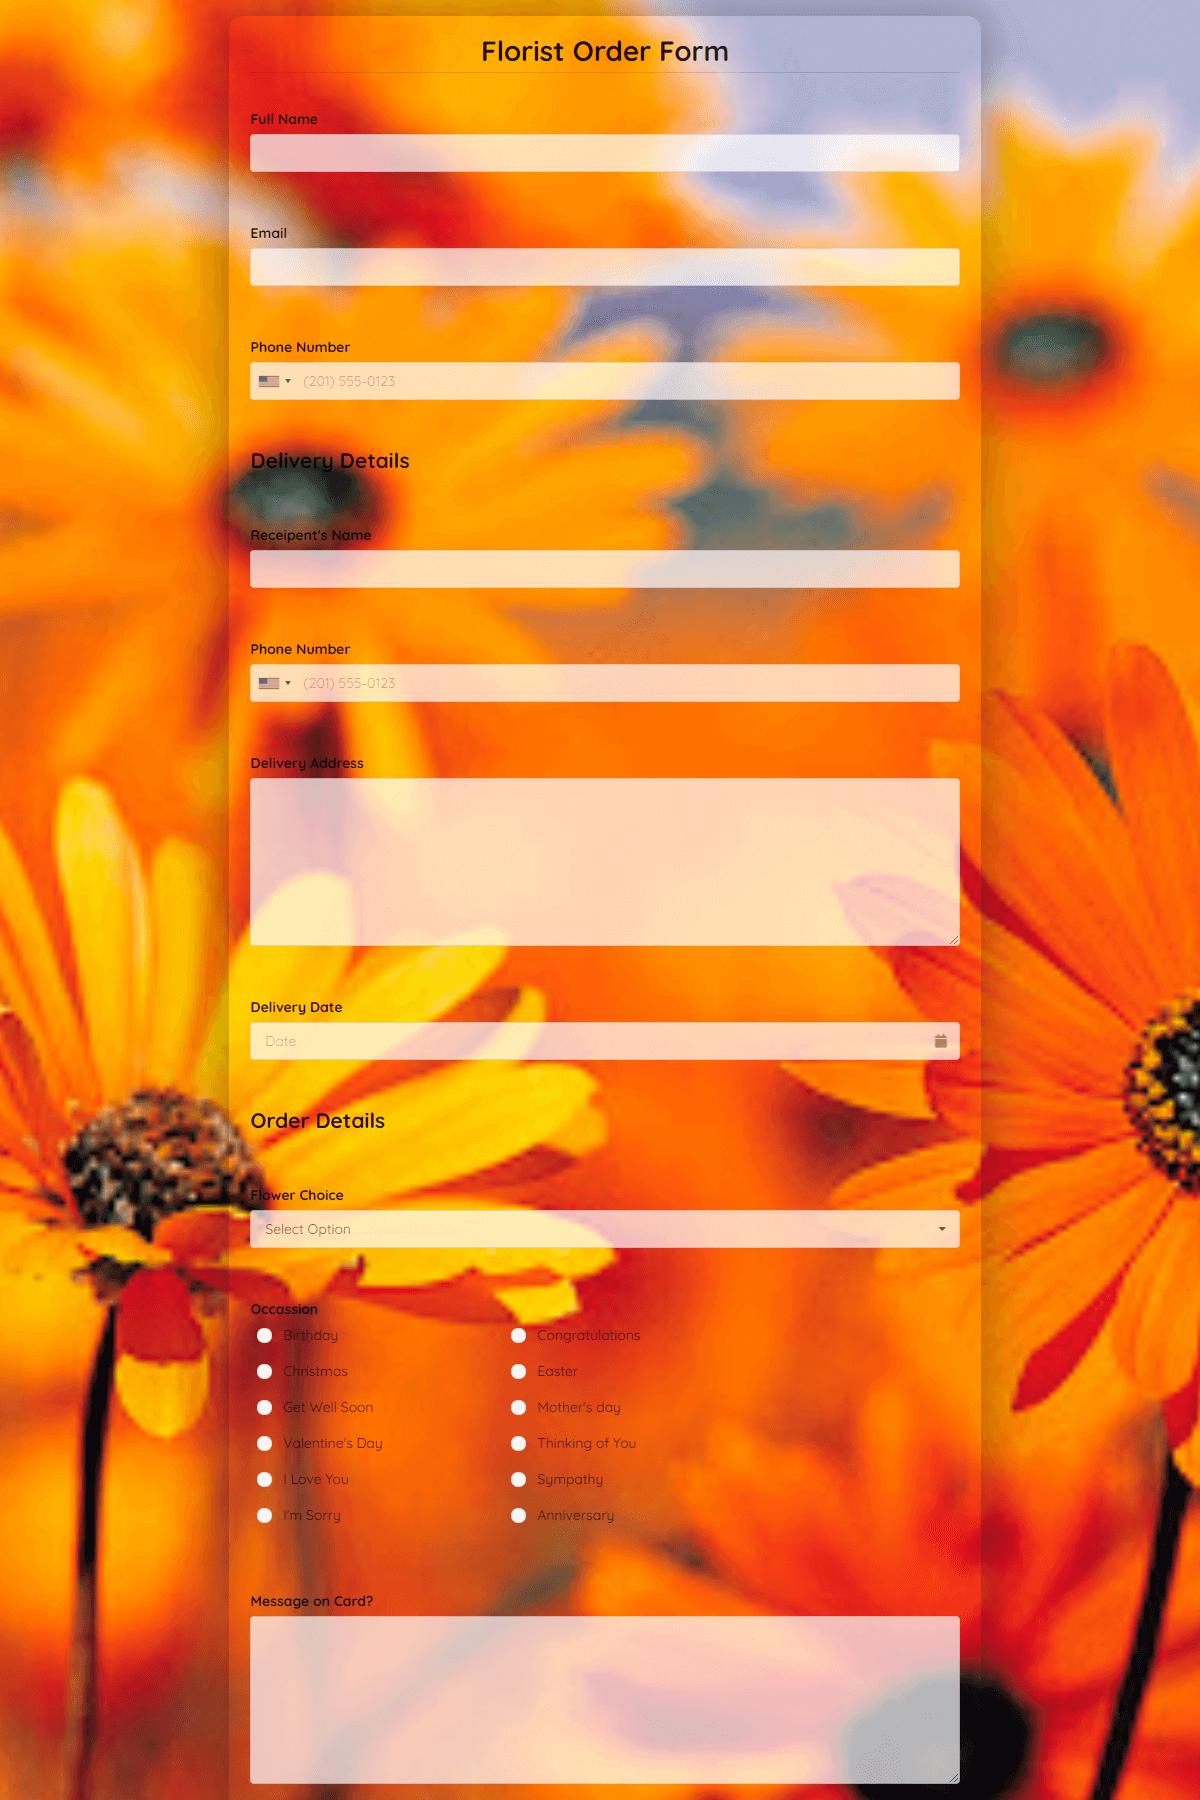 Florist Order Form Template template